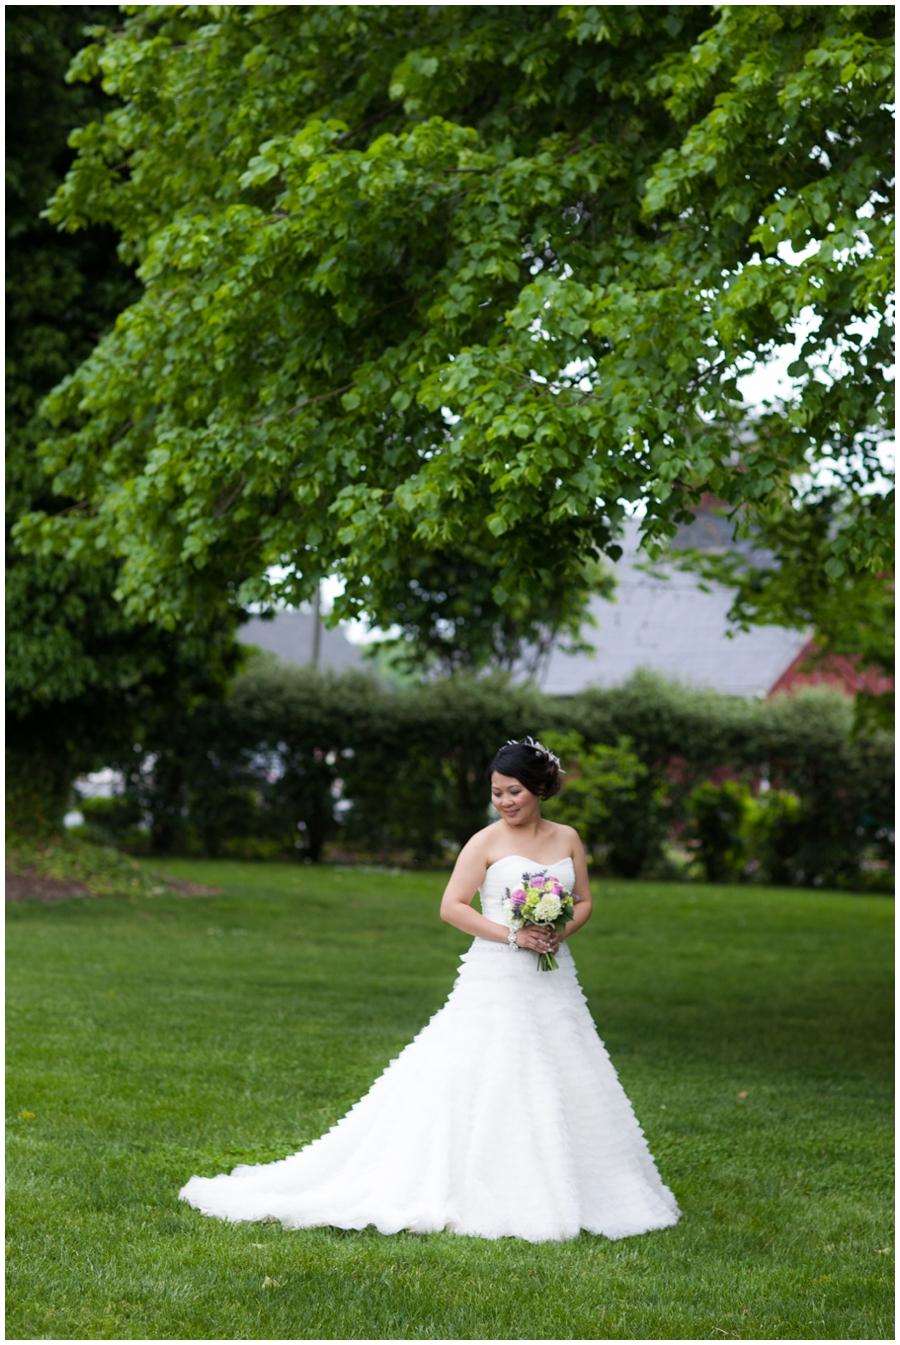 Chic Farm Wedding Photograph - Swan Harbor Farm Bridal Portrait